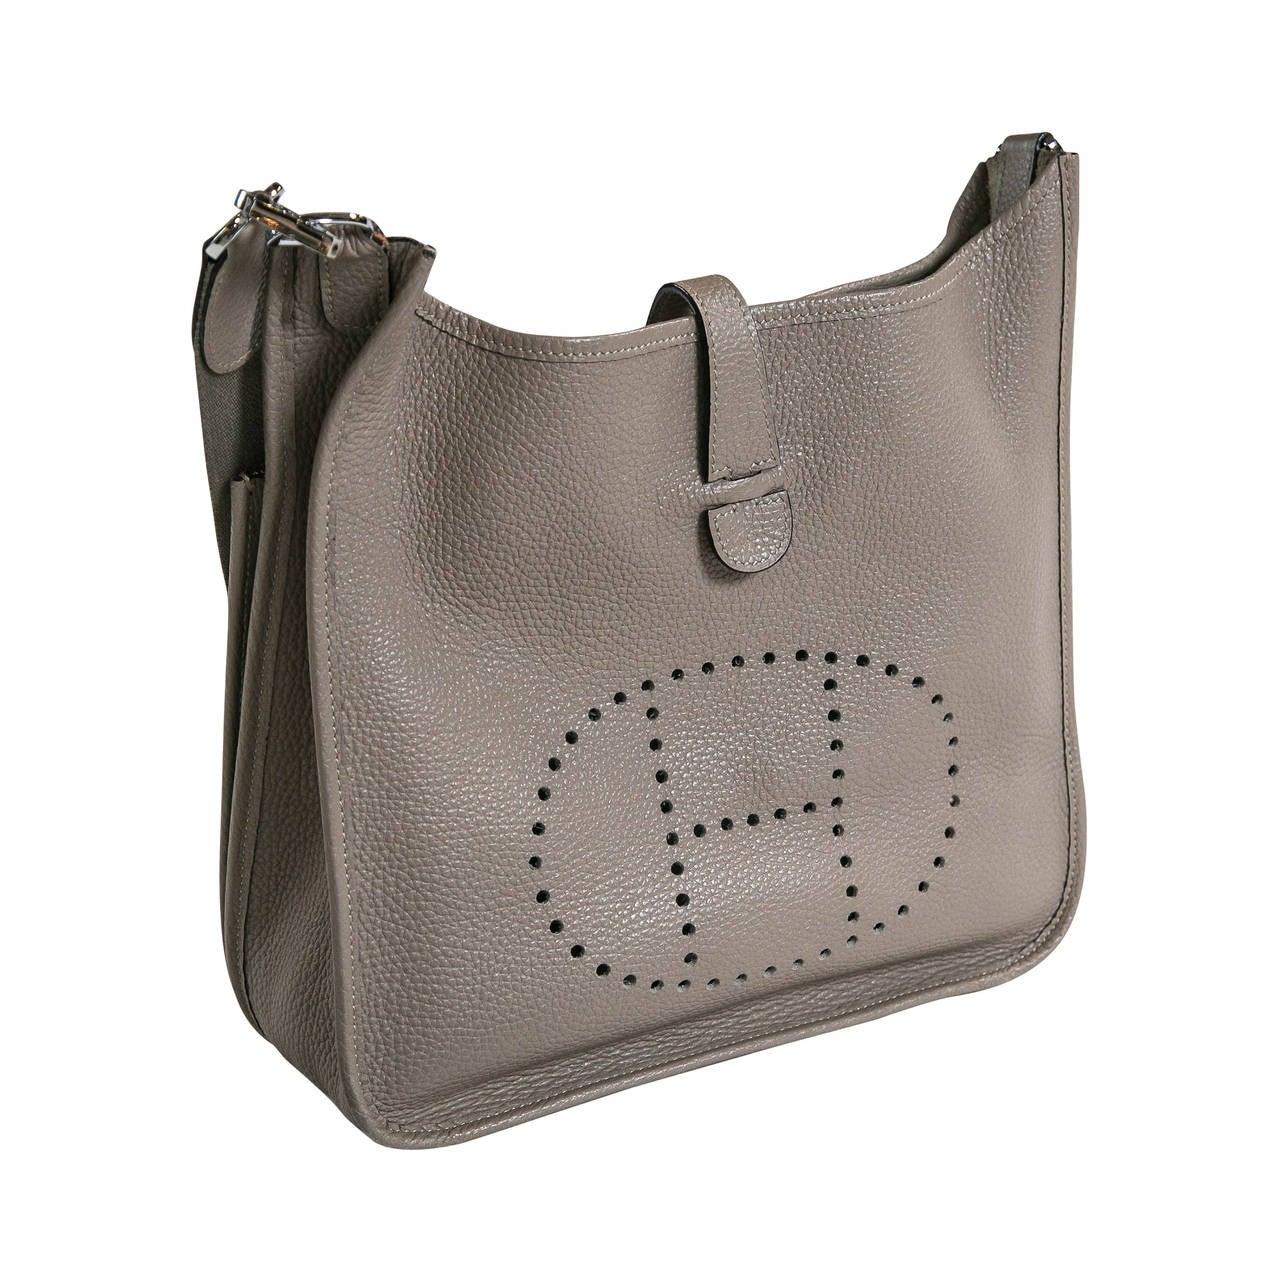 hermes leather handbag evelyne